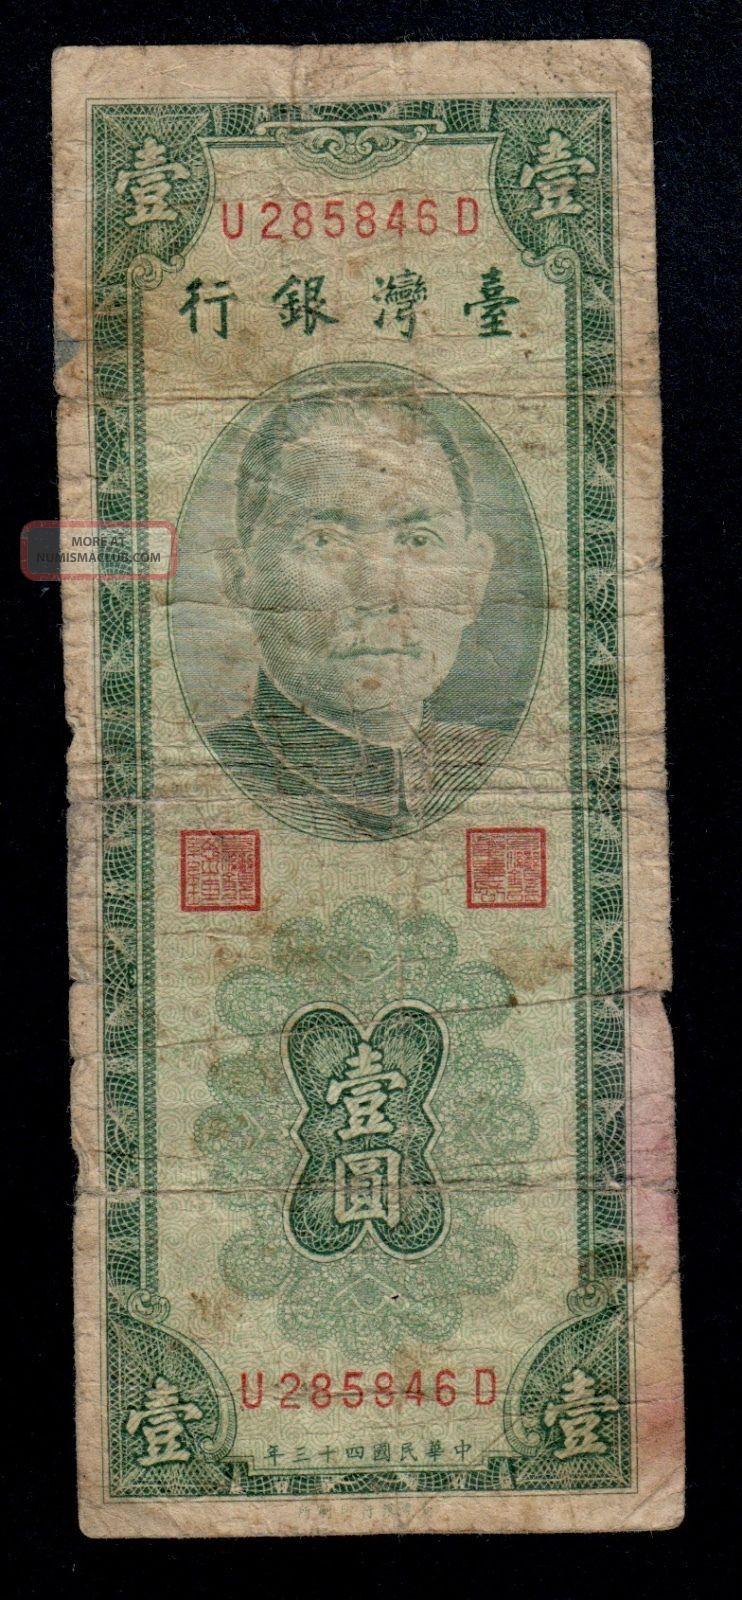 Taiwan 1 Yuan 1954 Pick 1965 Vg. Asia photo